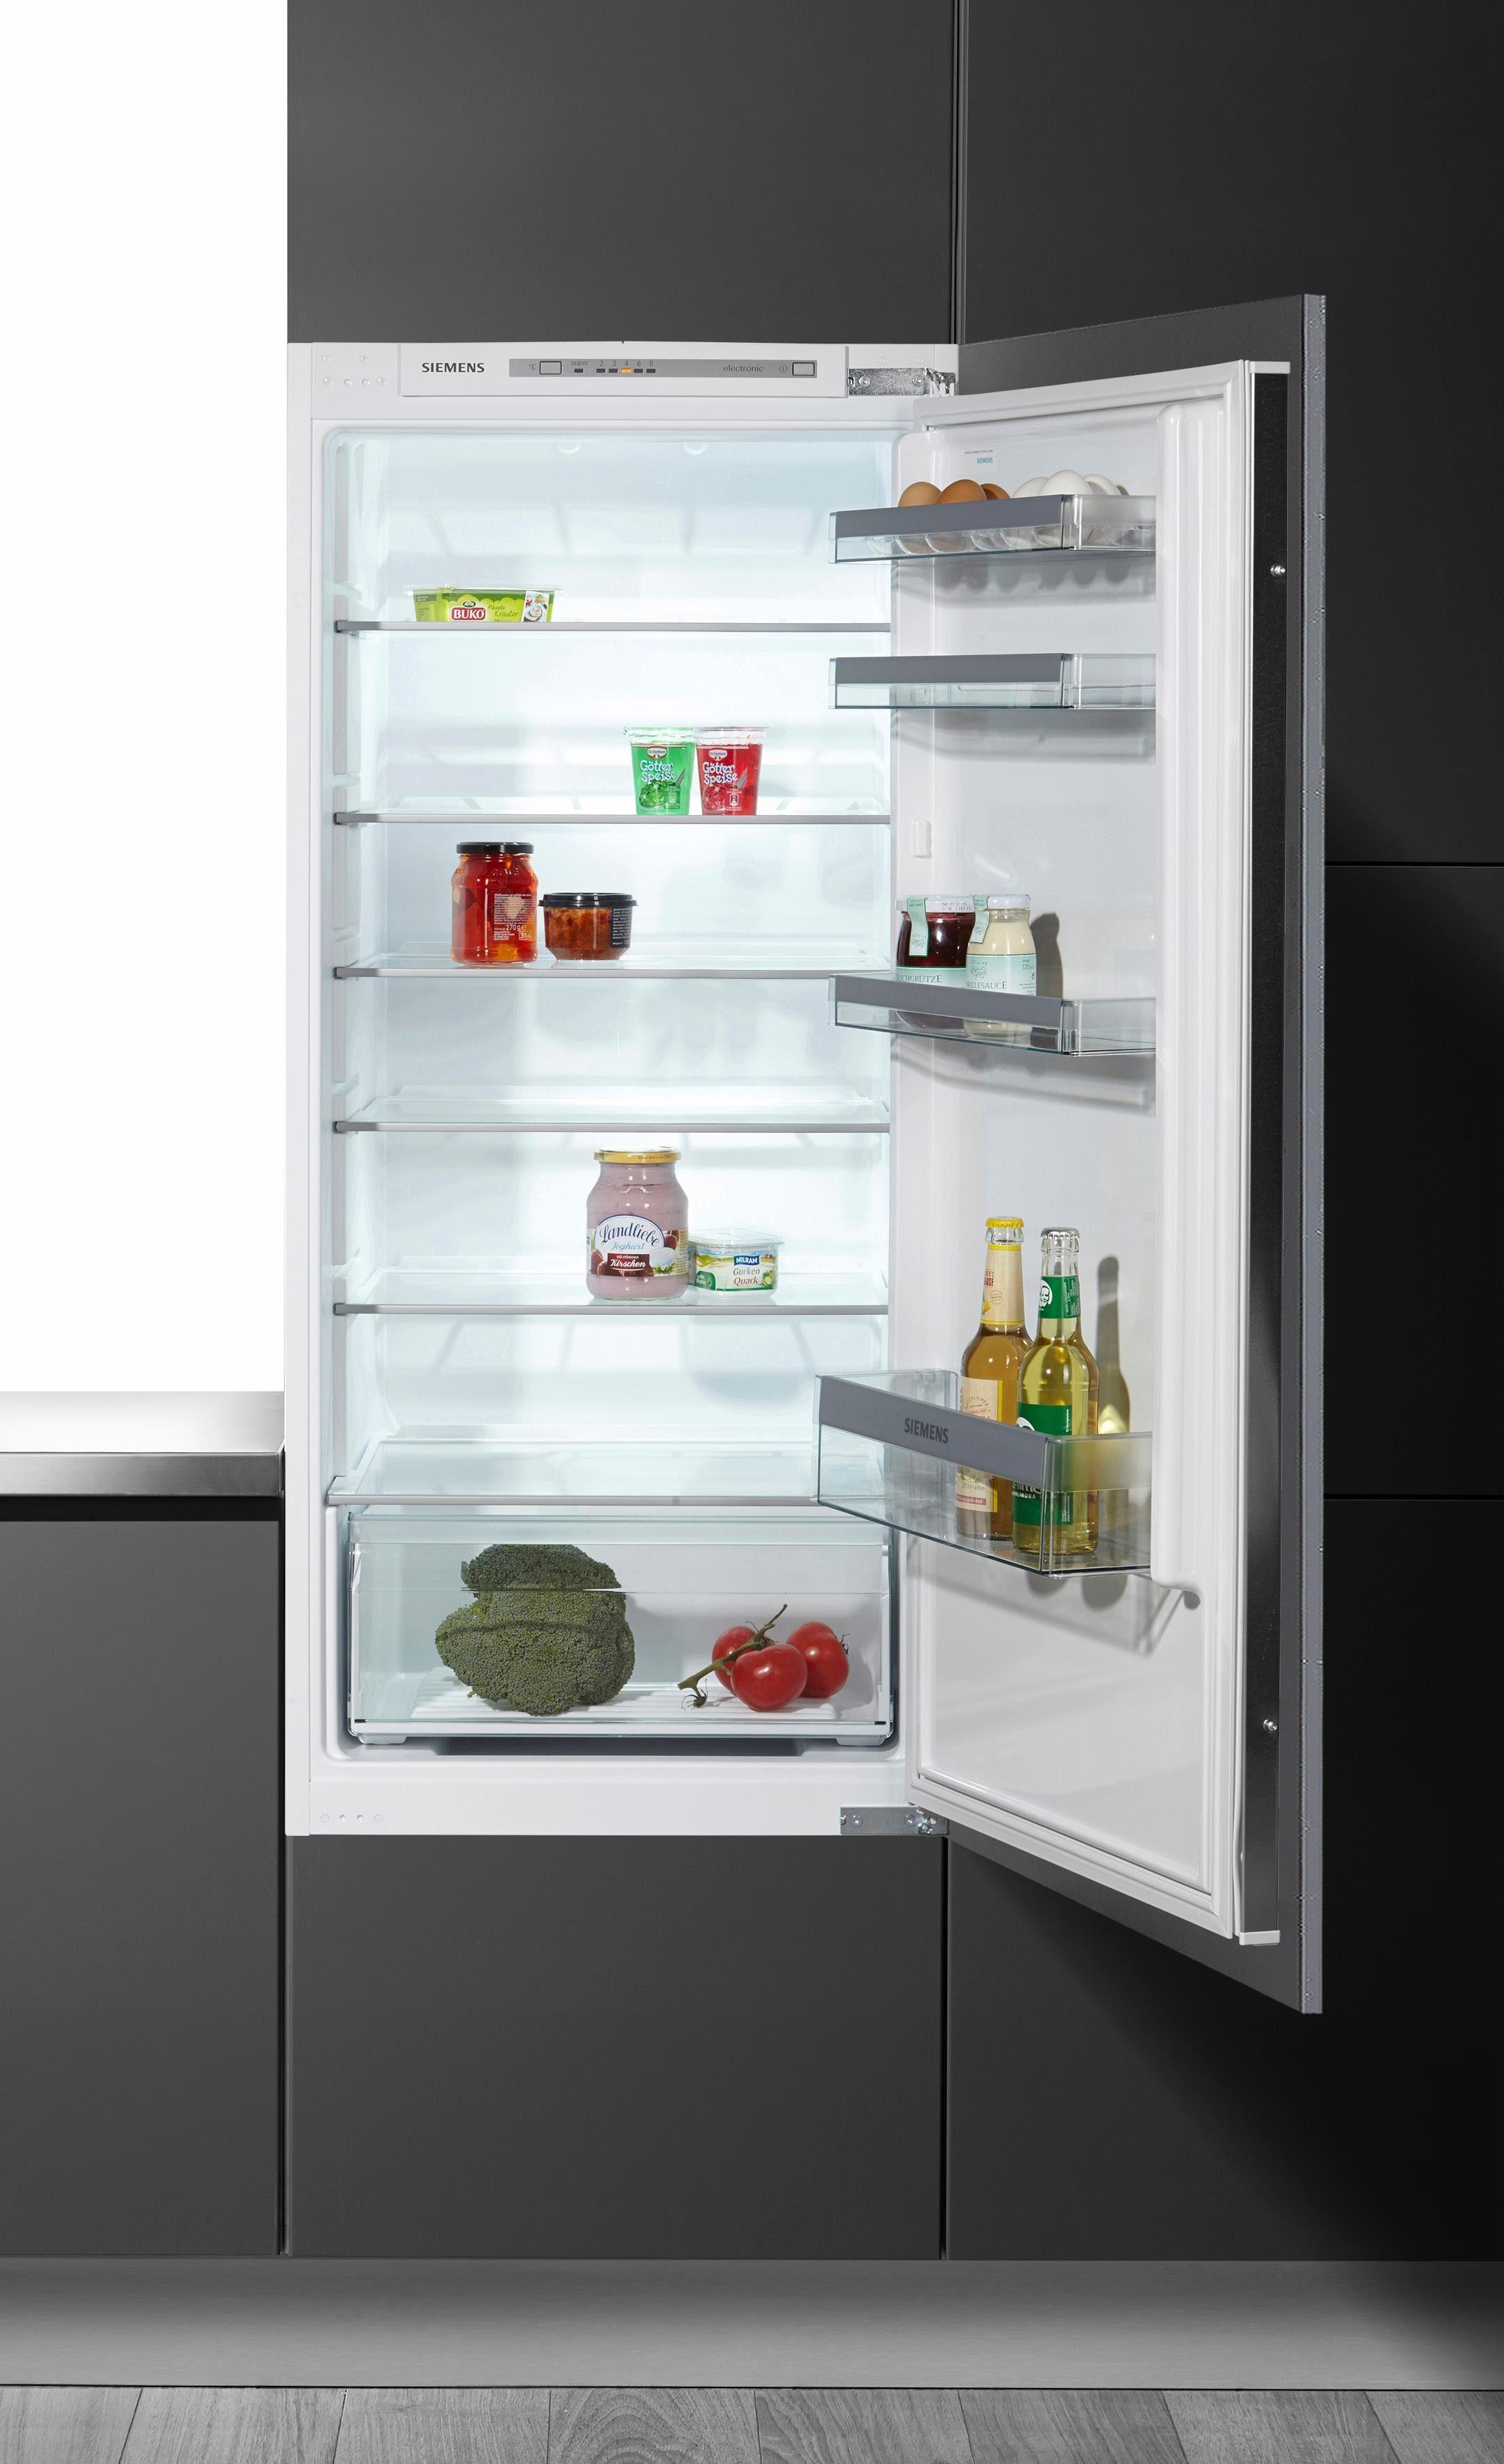 Siemens Einbau-Kühlautomat KI41RVS30, A++, 122,1 cm, vollintegrierbar